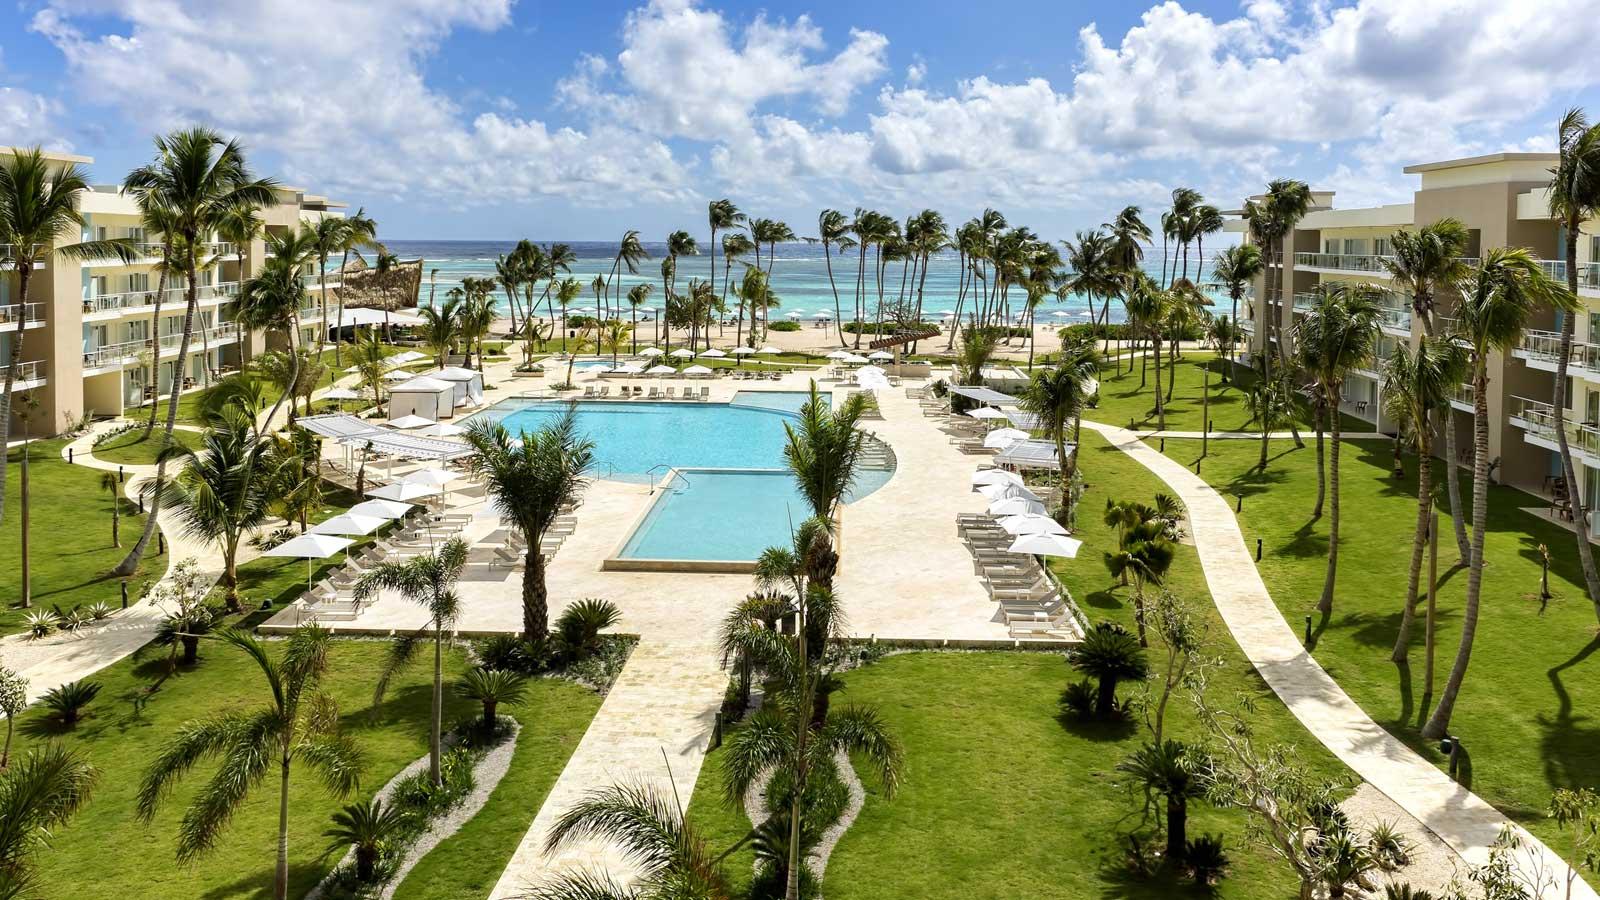 Hotel Westin Punta Cana